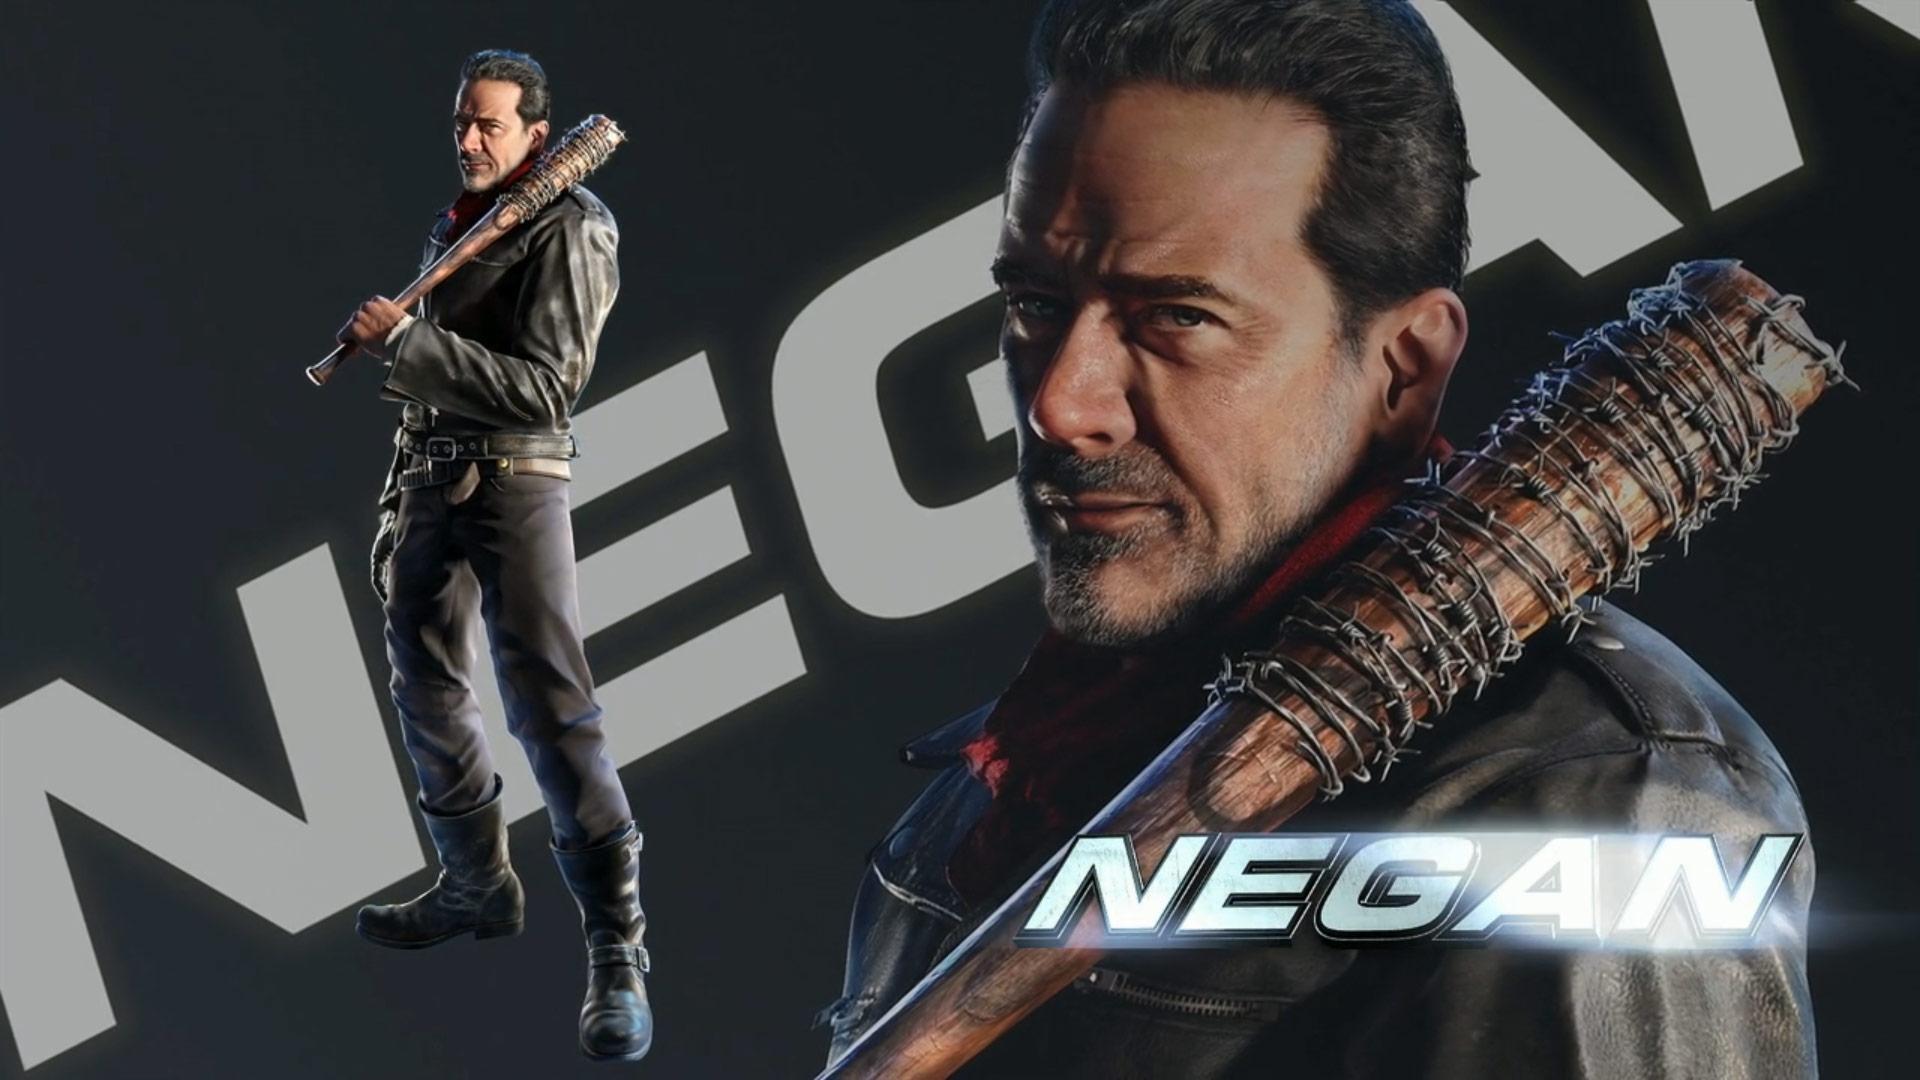 Tekken 7 Julia and Negan Reveal Screenshots 7 out of 12 image gallery